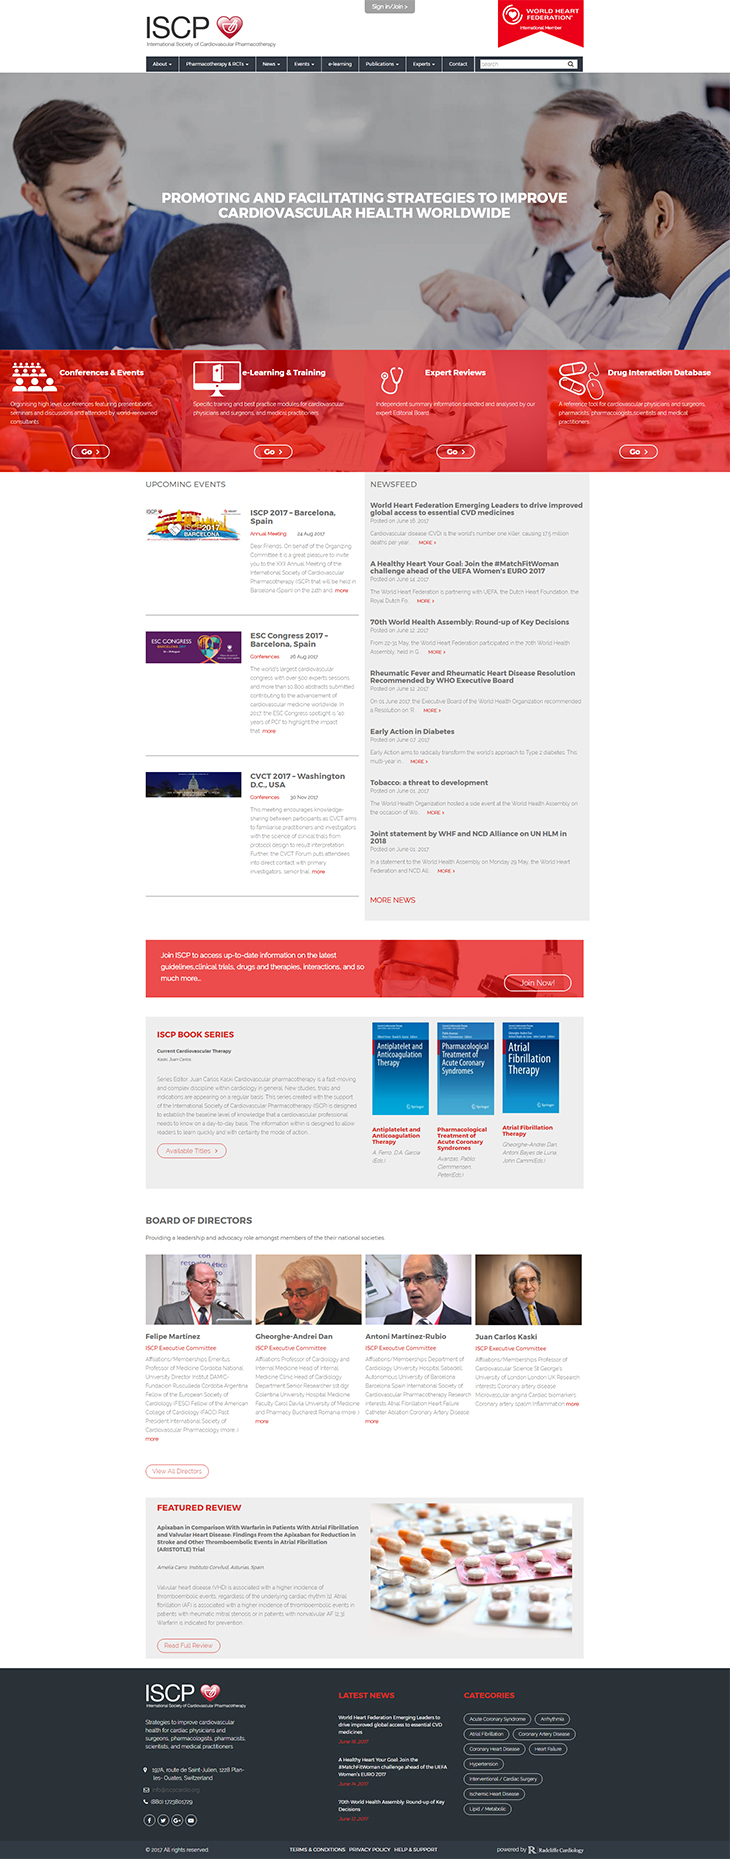 International Society of Cardiovascular Pharmacotherapy - WordPress